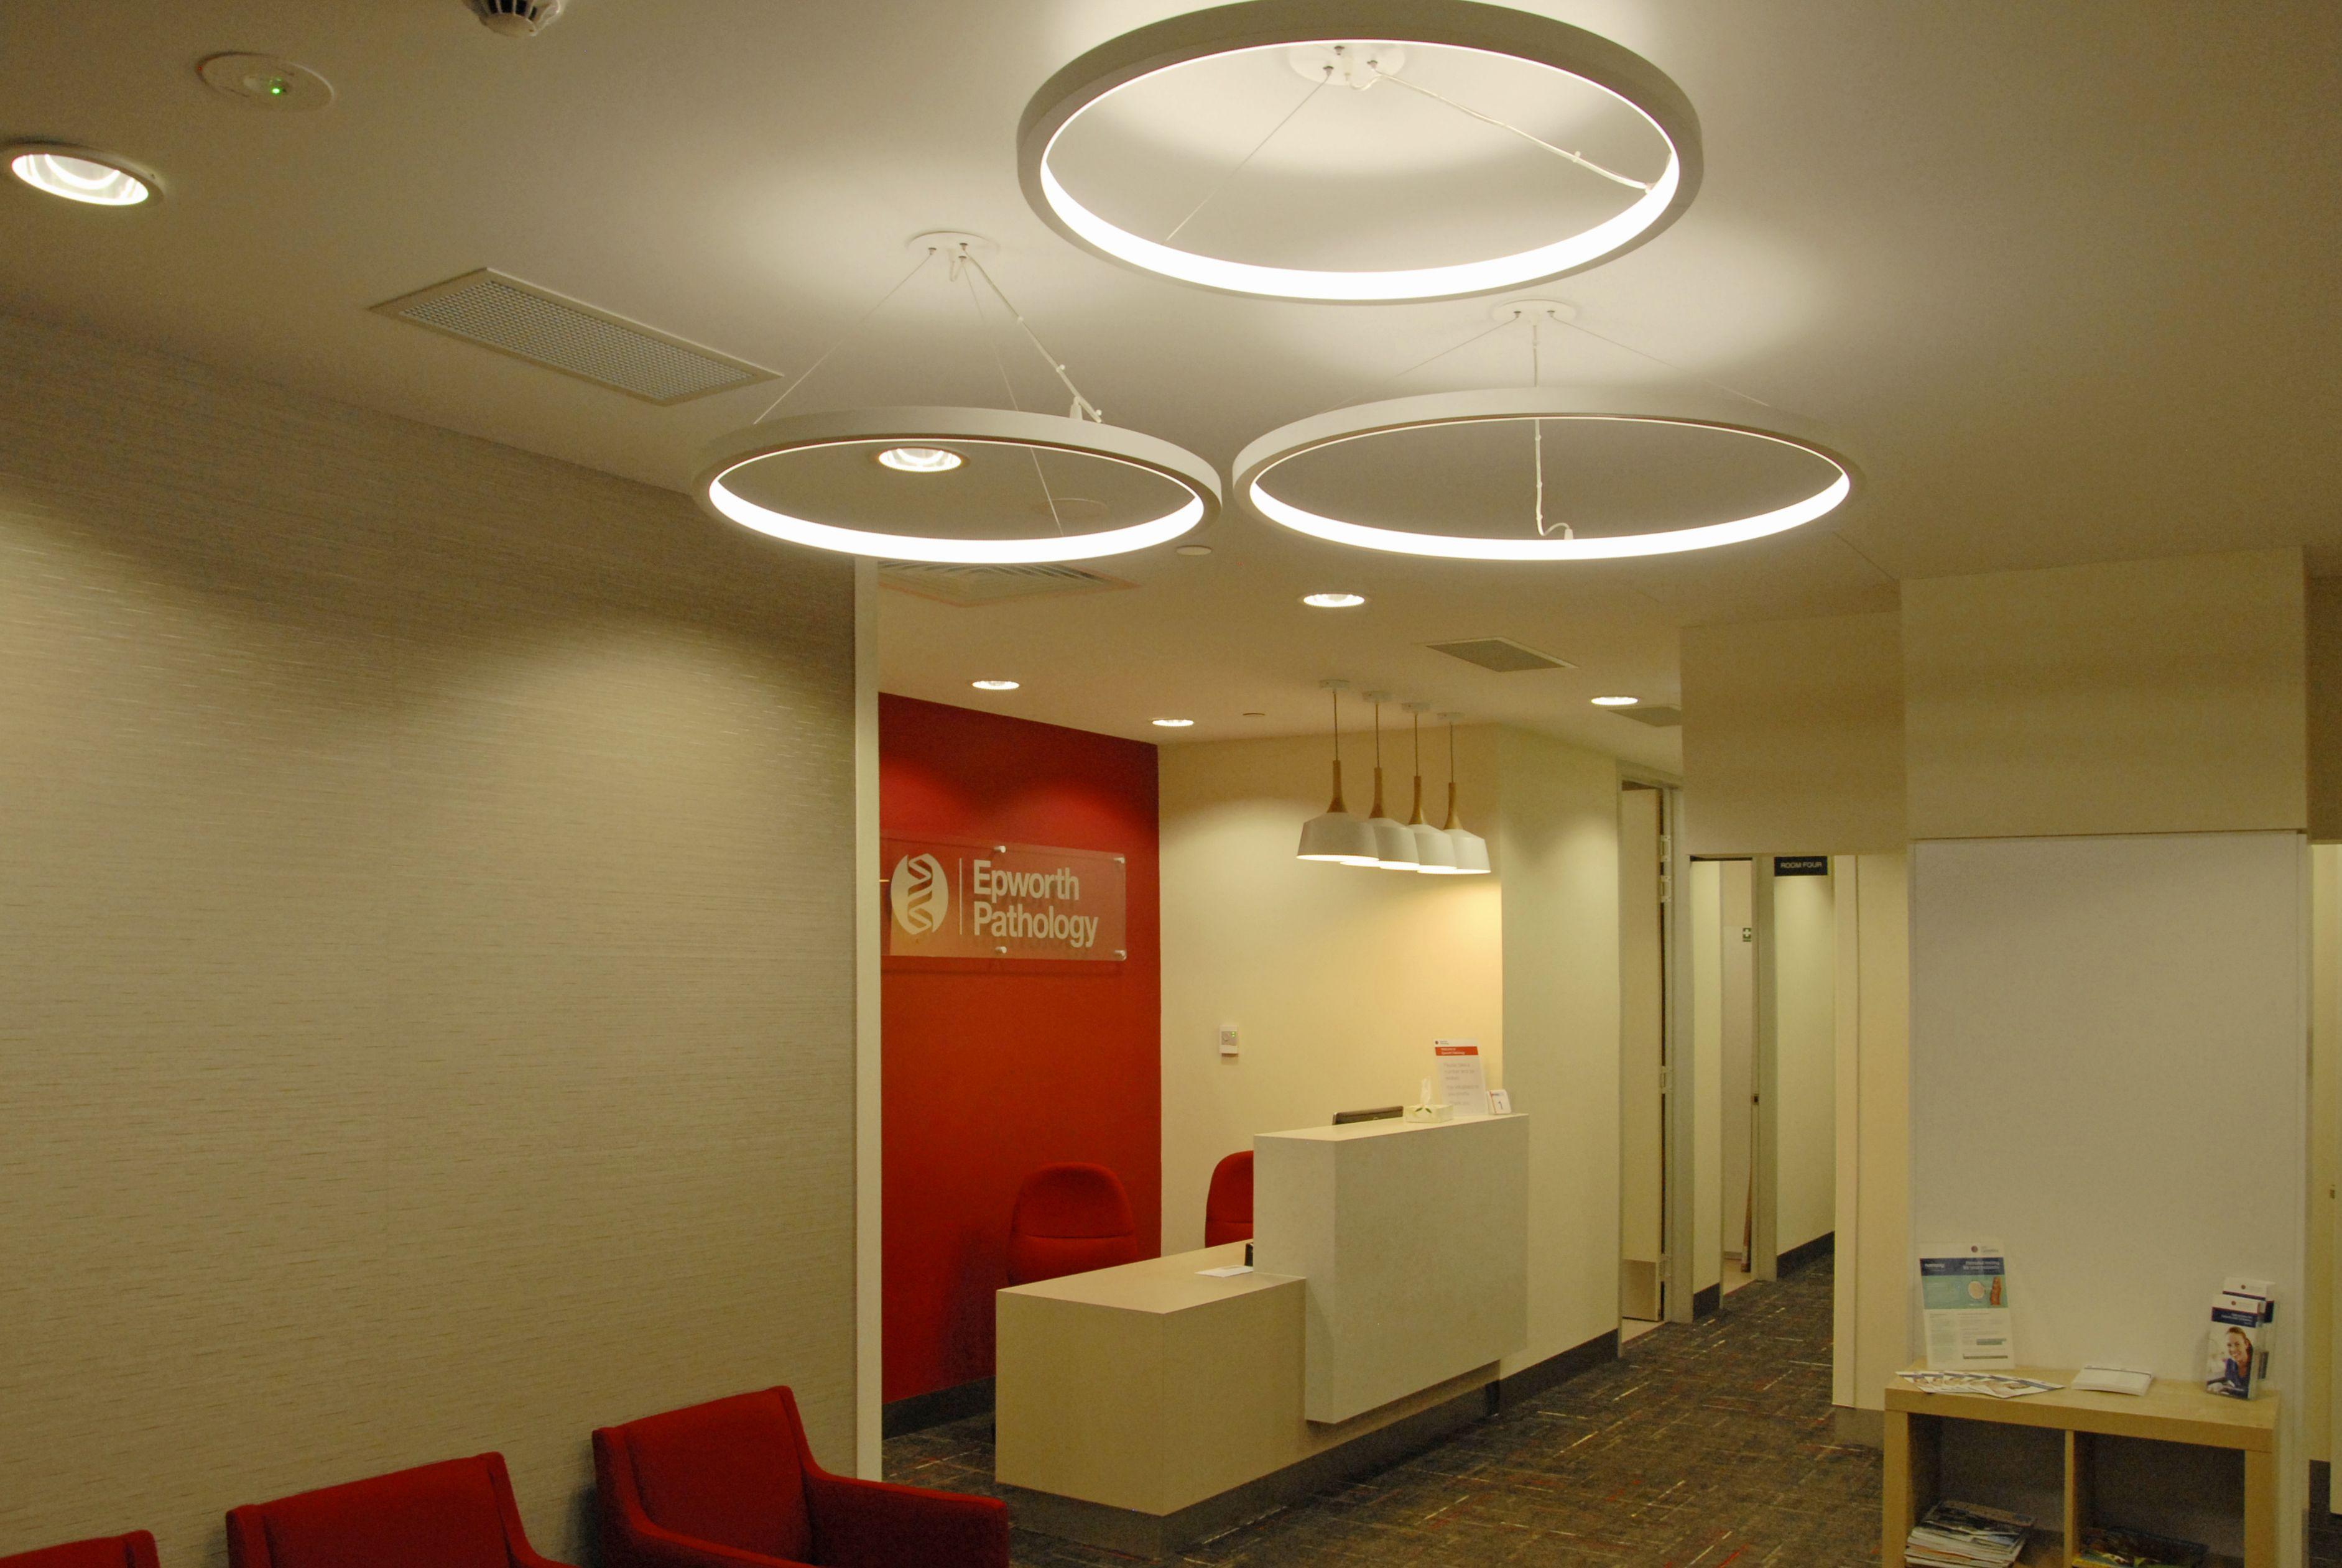 Epworth geelong hospital pathology waiting room hadoni